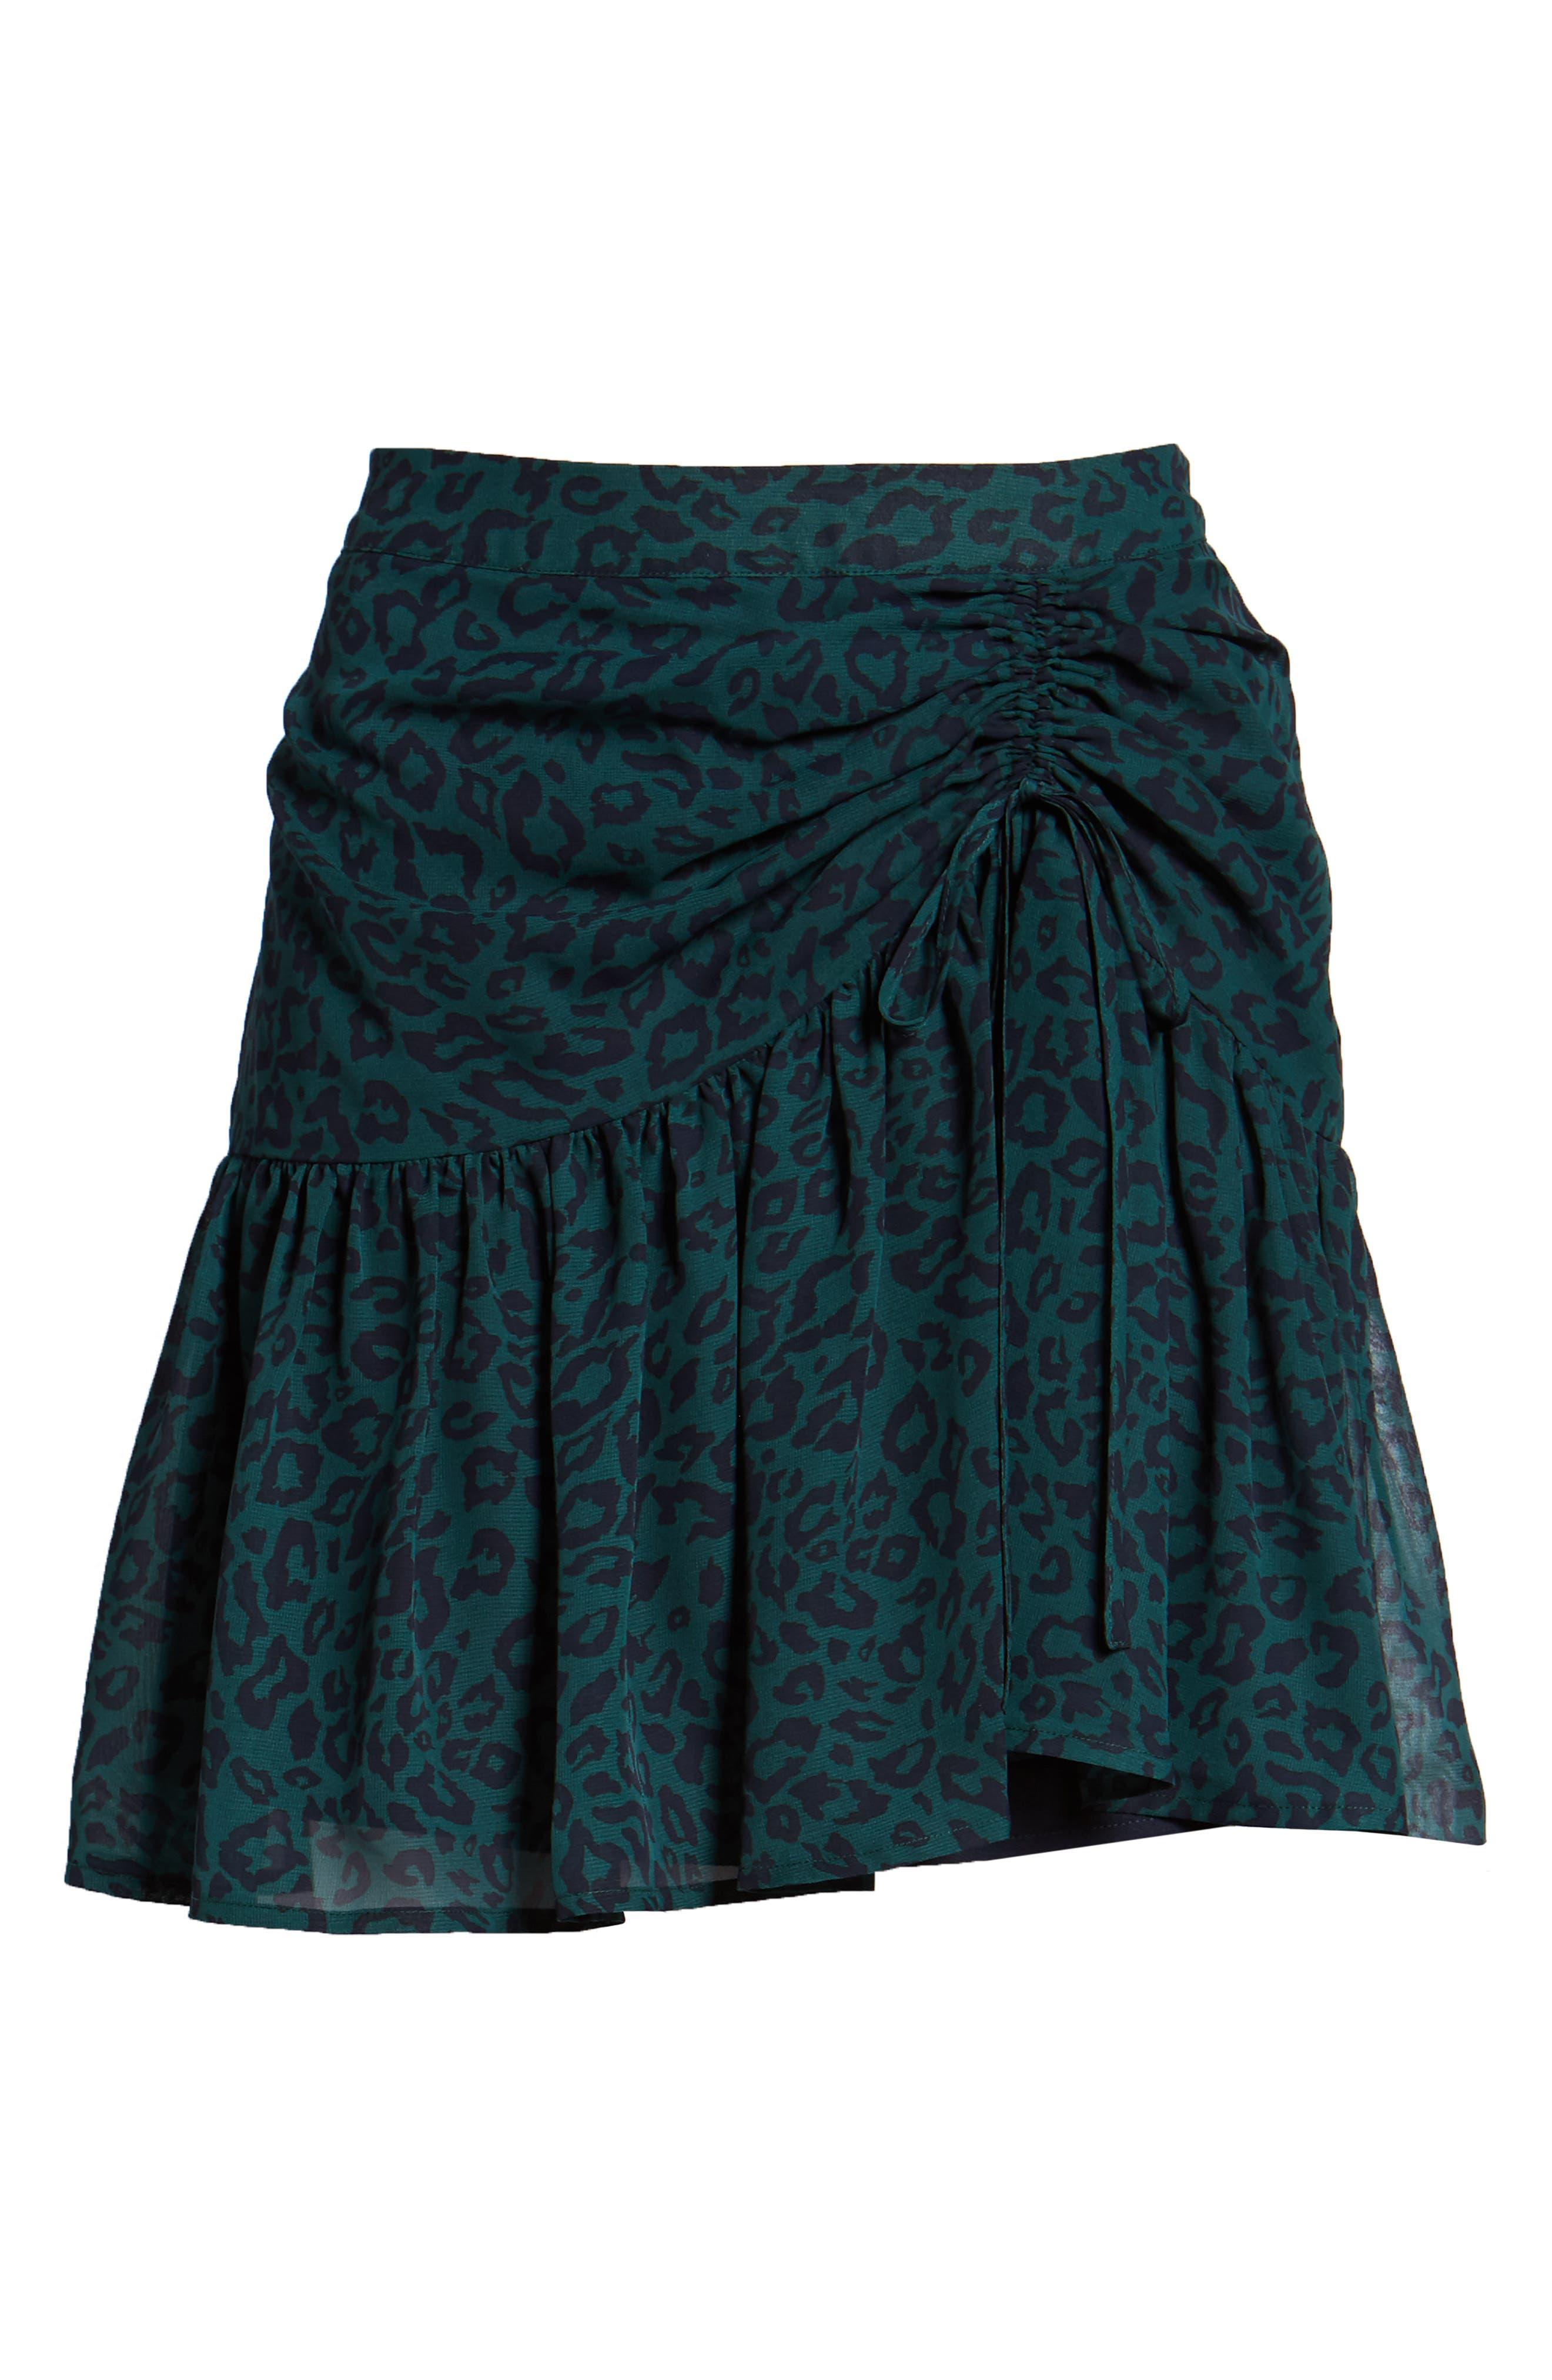 Ruched Ruffle Miniskirt,                             Alternate thumbnail 6, color,                             300